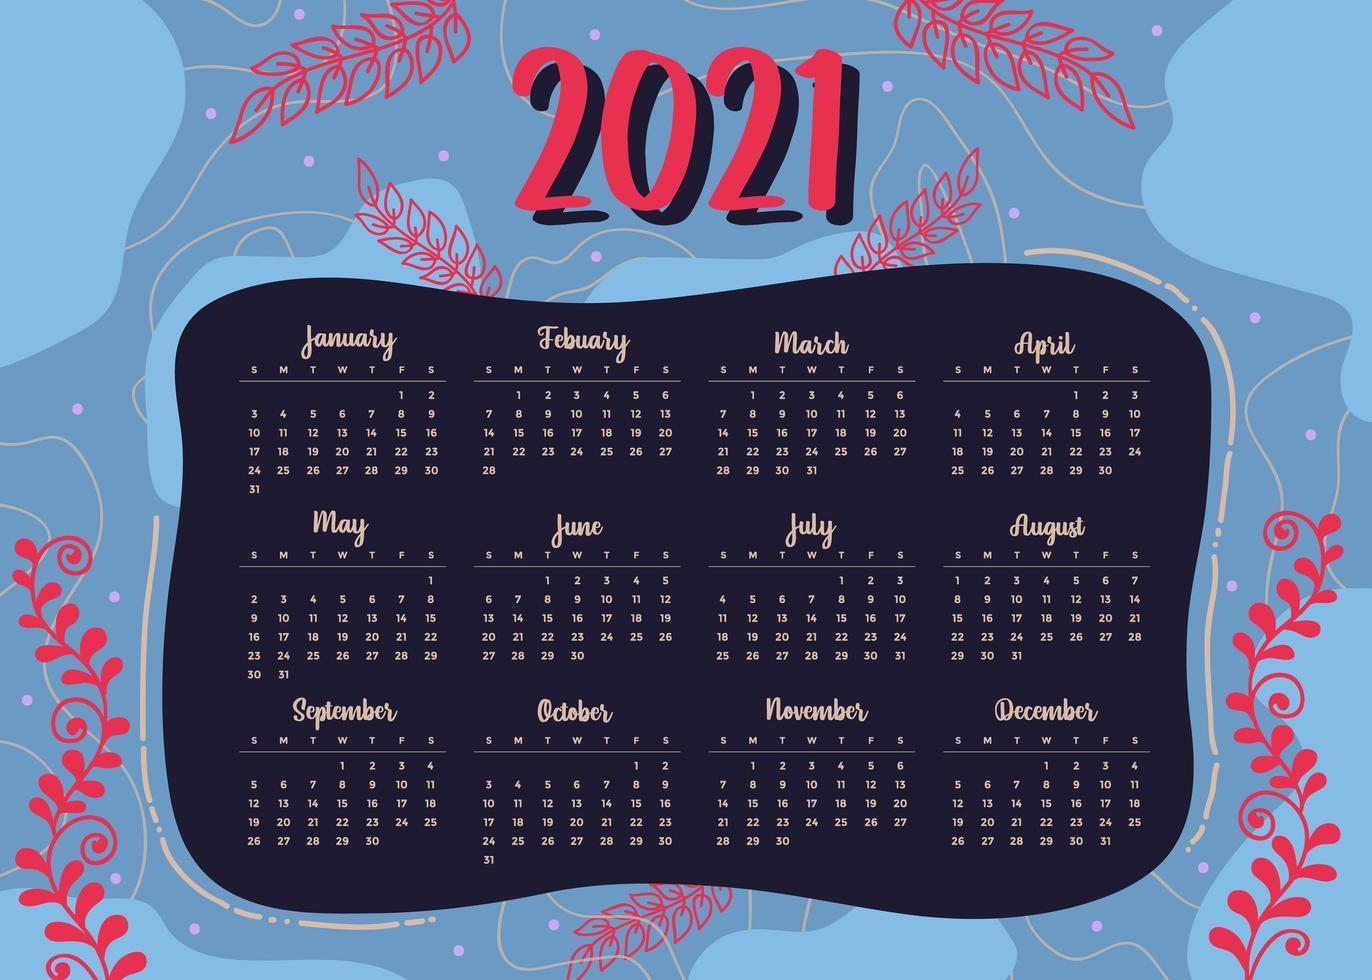 moderner Stil 2021 Neujahrskalender Design im geometrischen Stil vektor